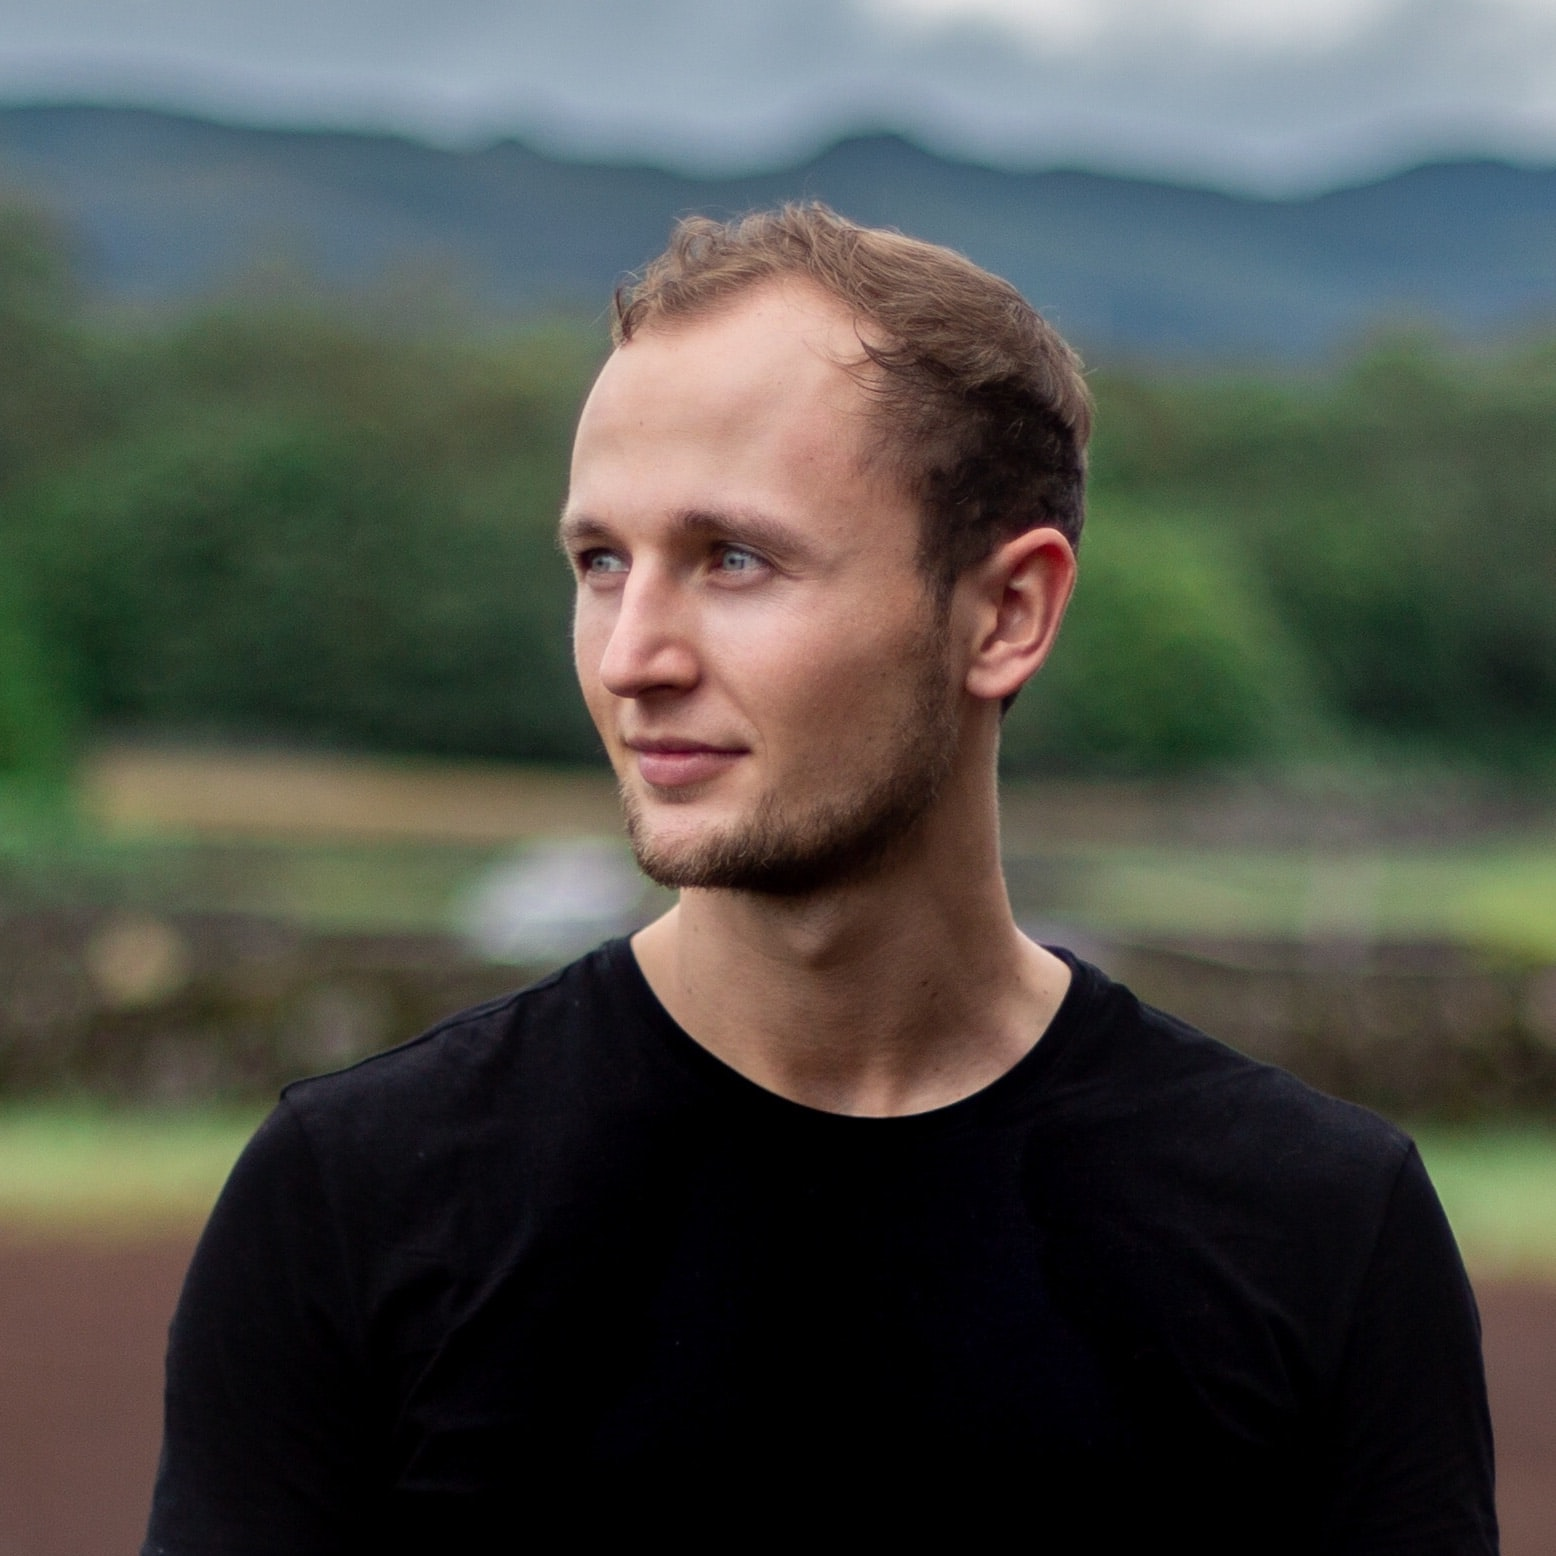 Go to Tobias Schmücker's profile